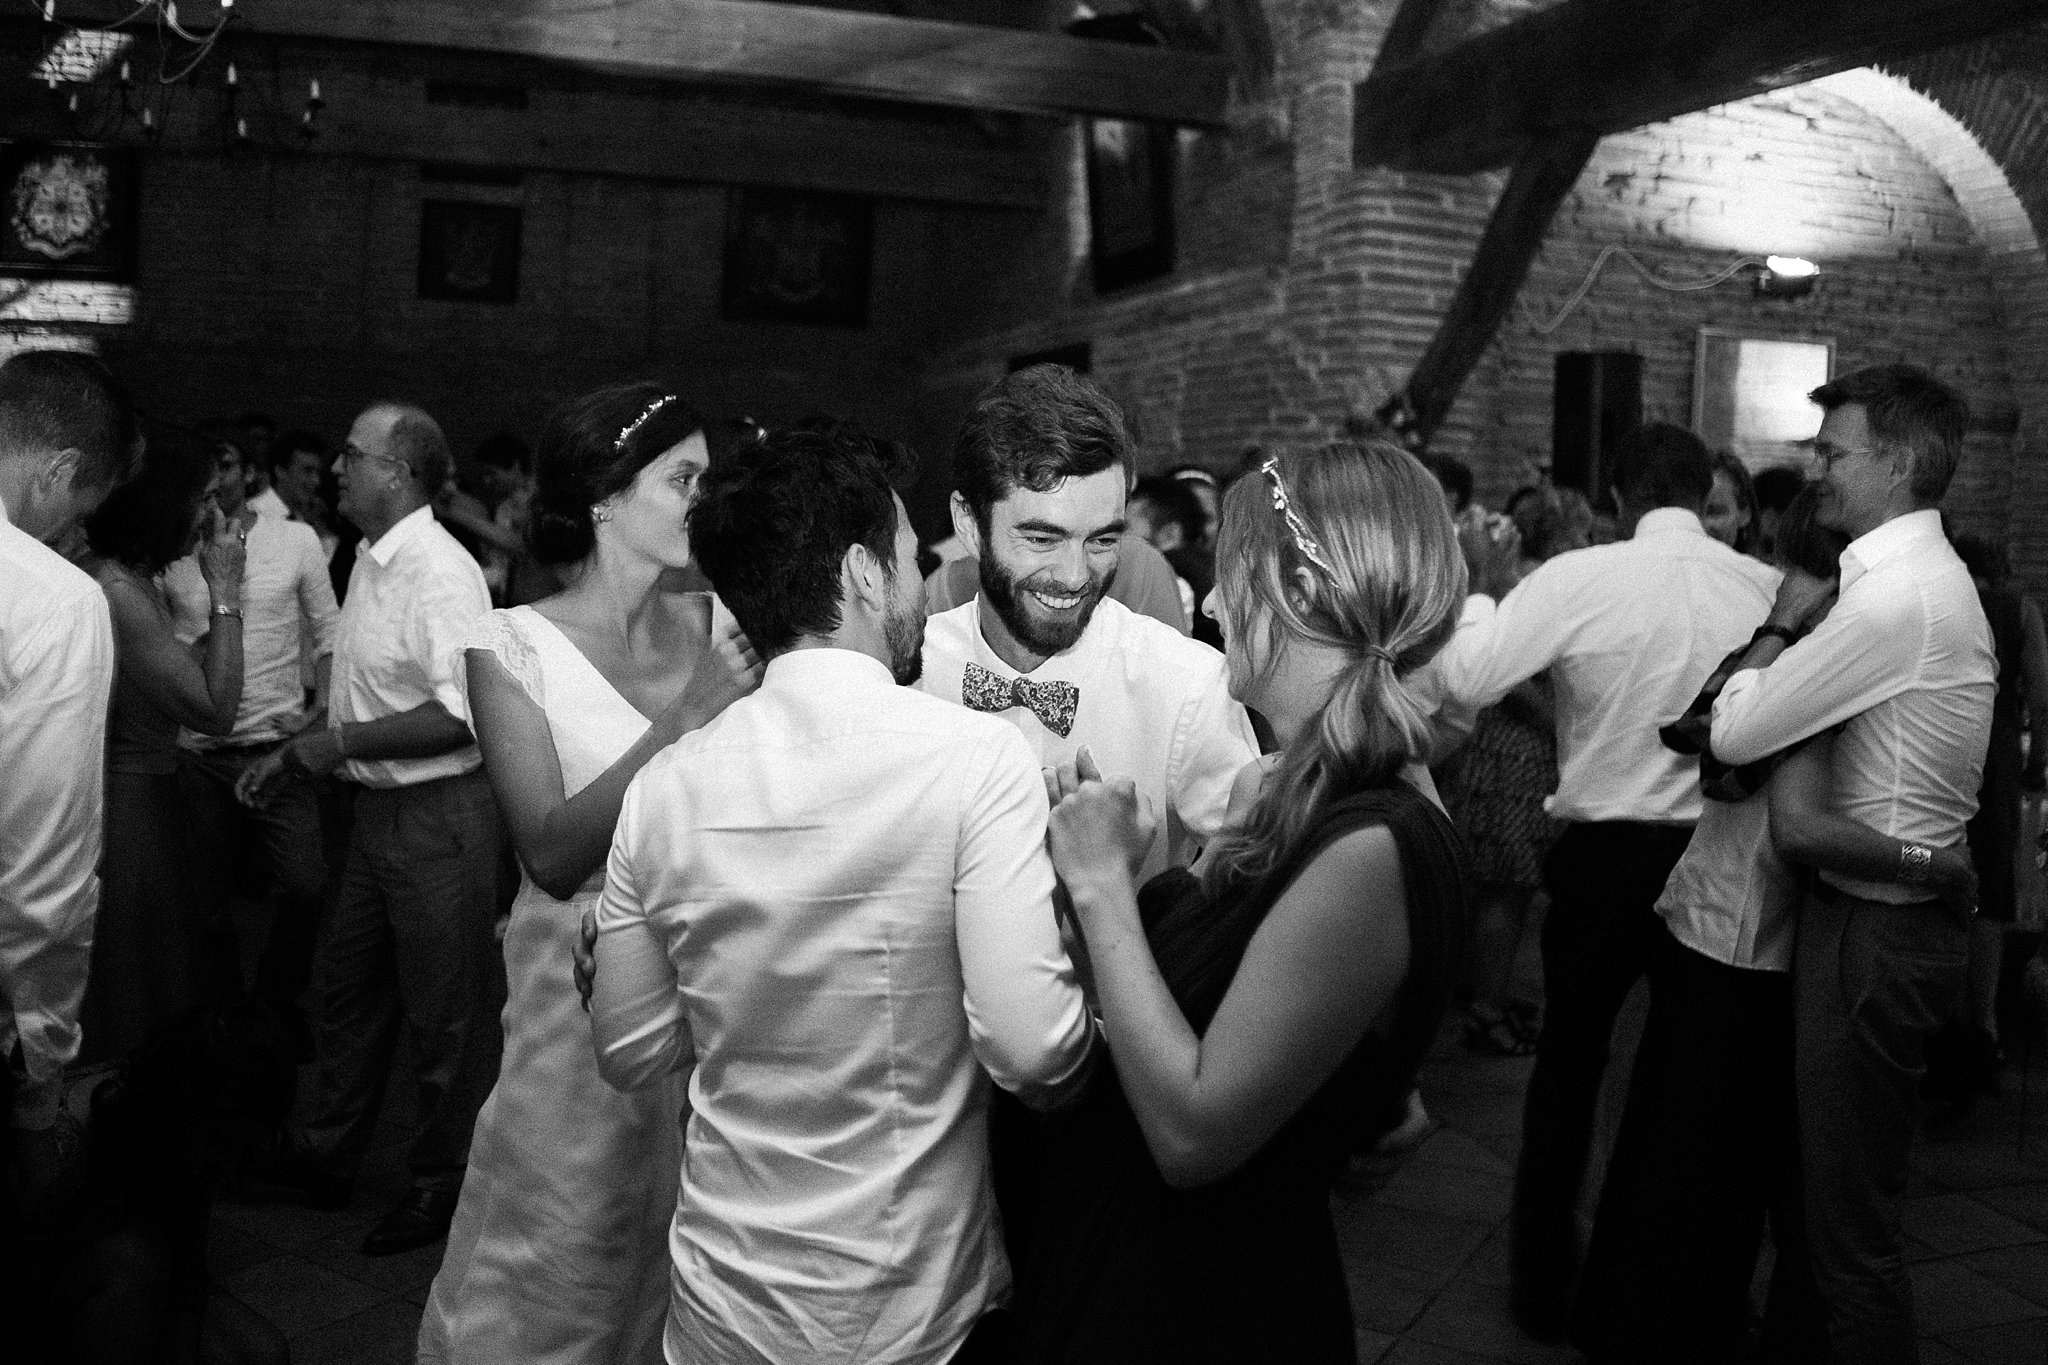 Mariage-a-la-maison-secall-hugo-hennequin-photographe-mariage-perpignan_0107.jpg